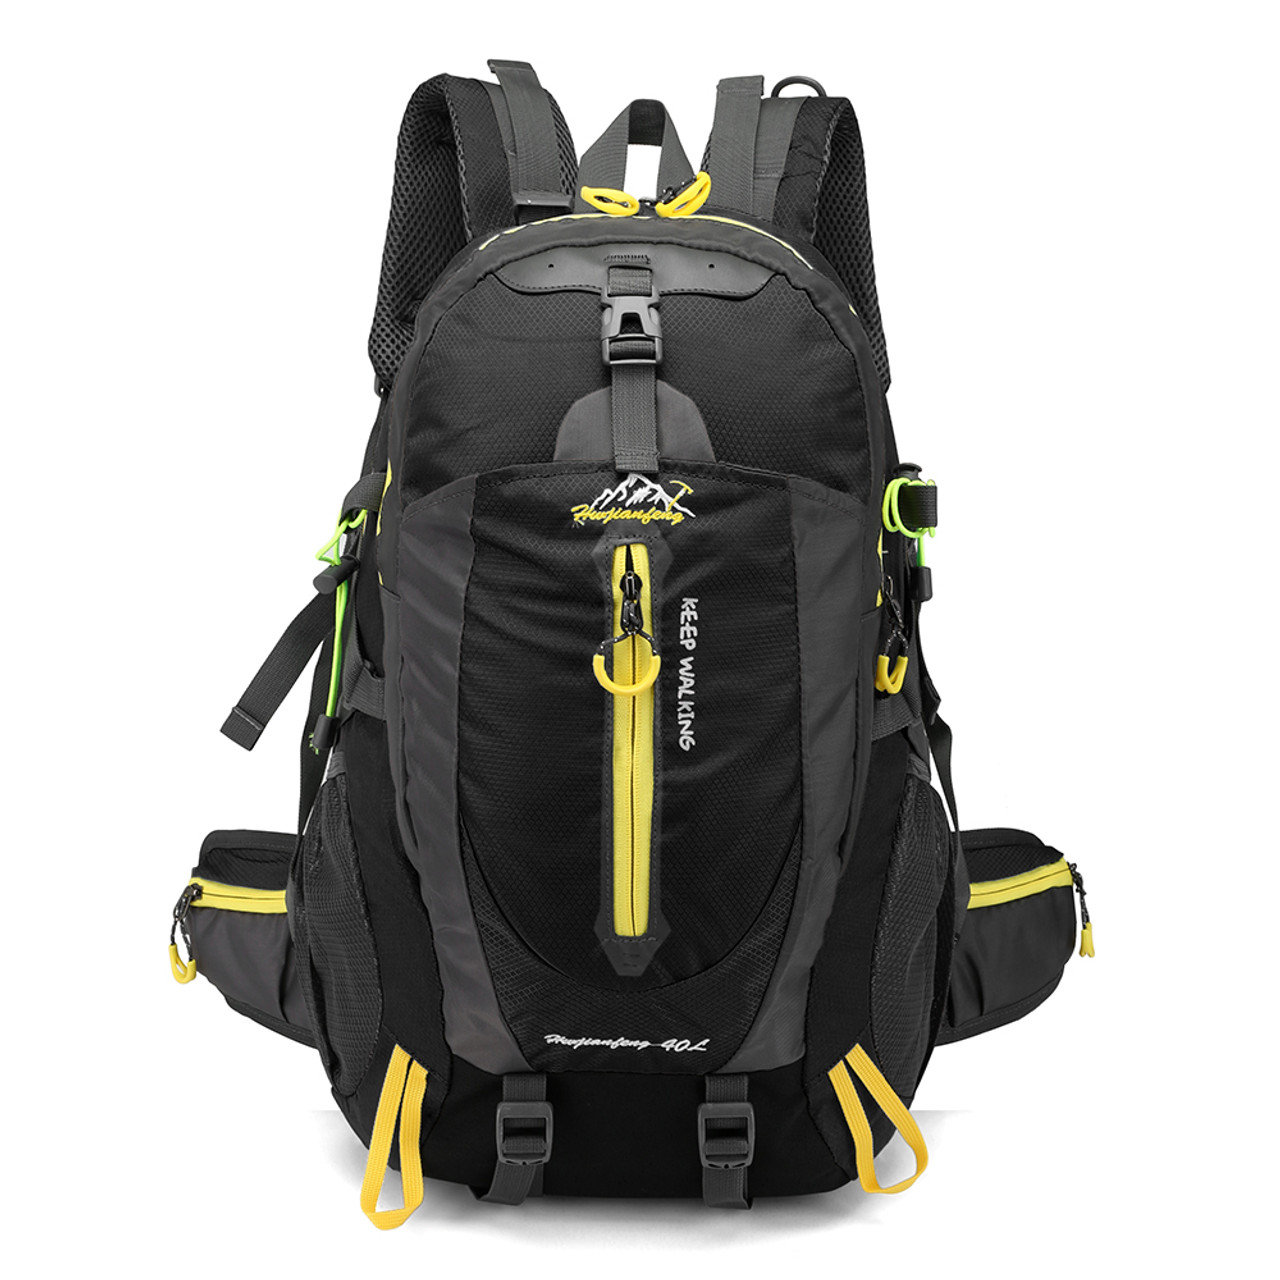 d54de589f37a 40L Waterproof Climbing Bag Travel Backpack Bike Bicycle Bag Camping Hike  Laptop Daypack Rucksack Outdoor Men ...